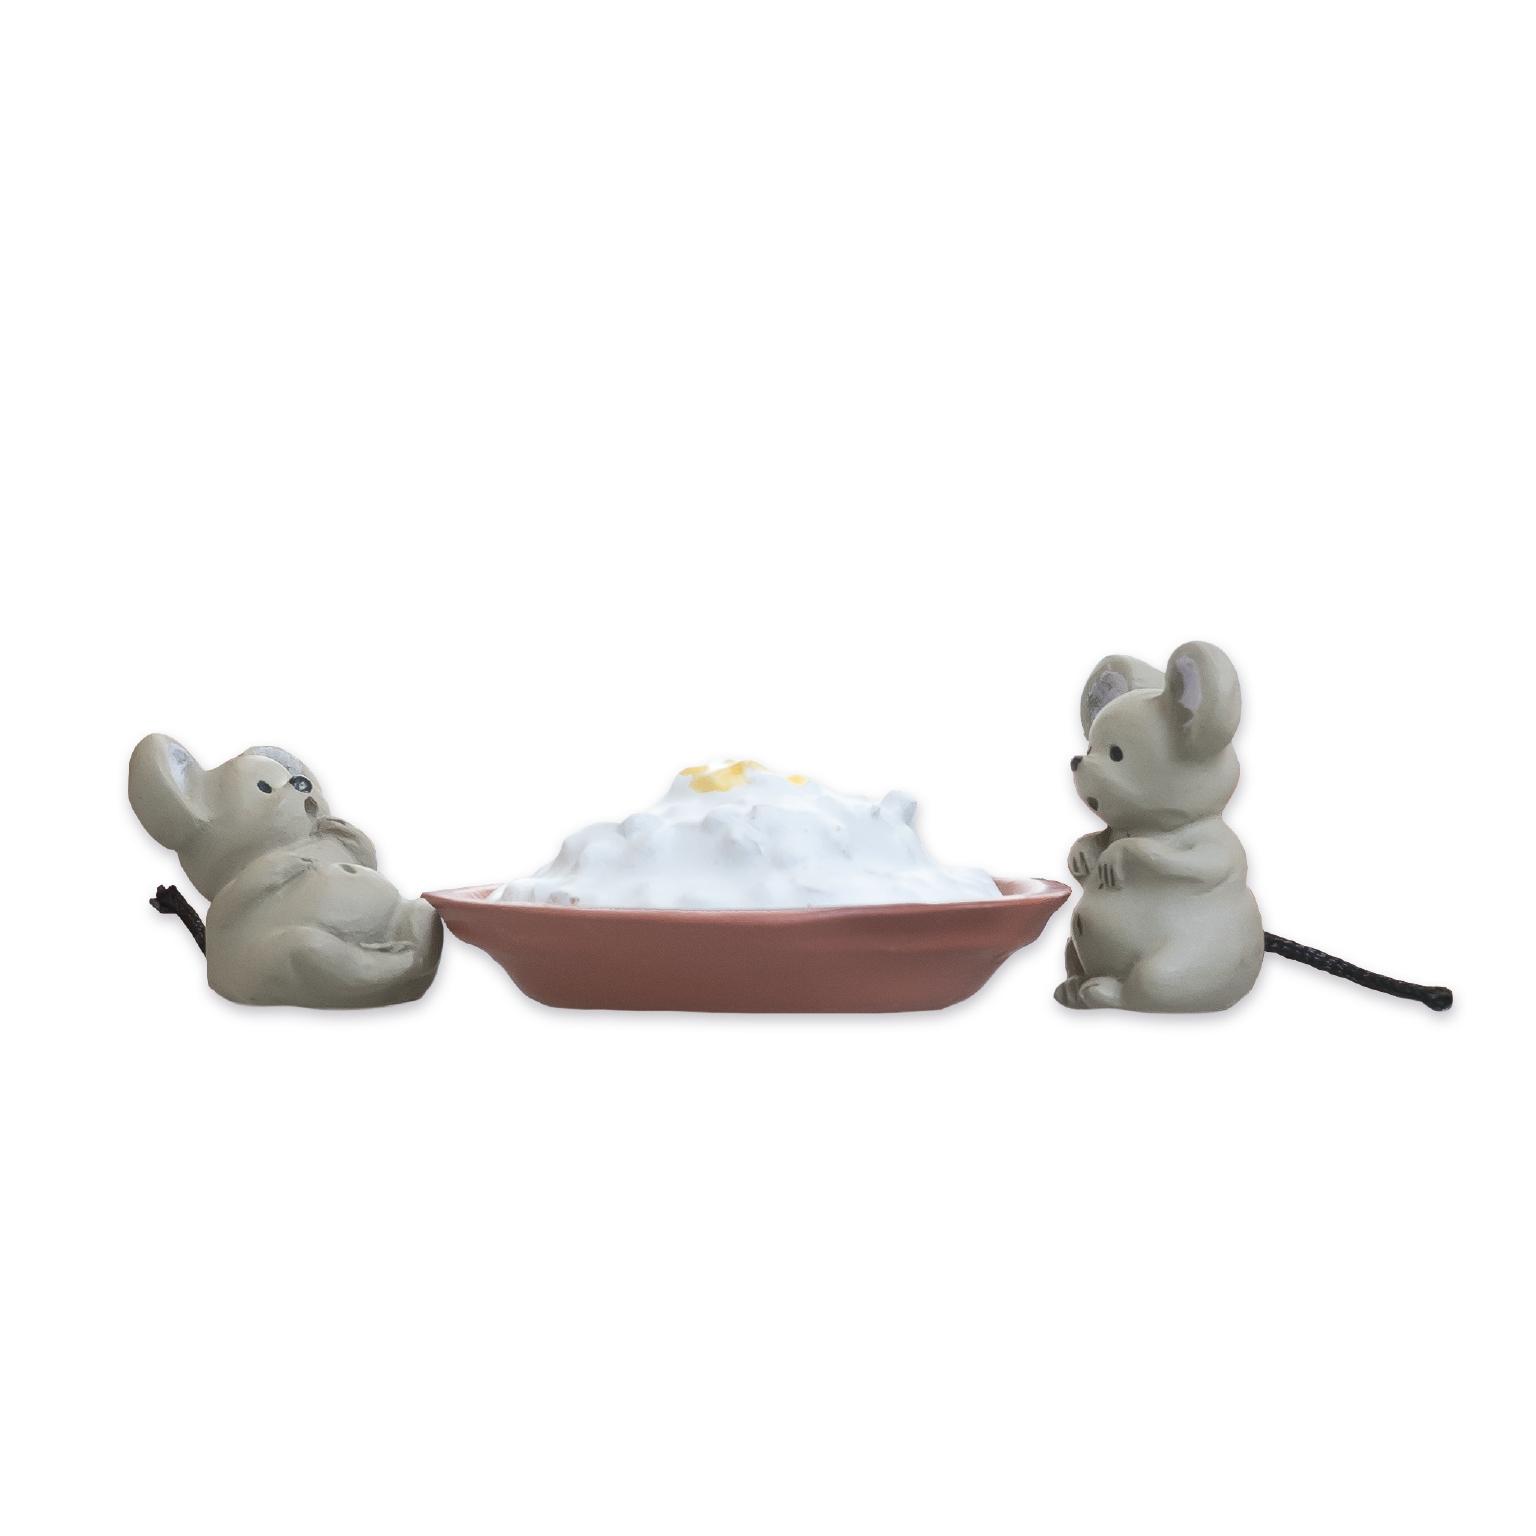 Klarborgnisser - Gnist & Hannibal With Porridge (93283)